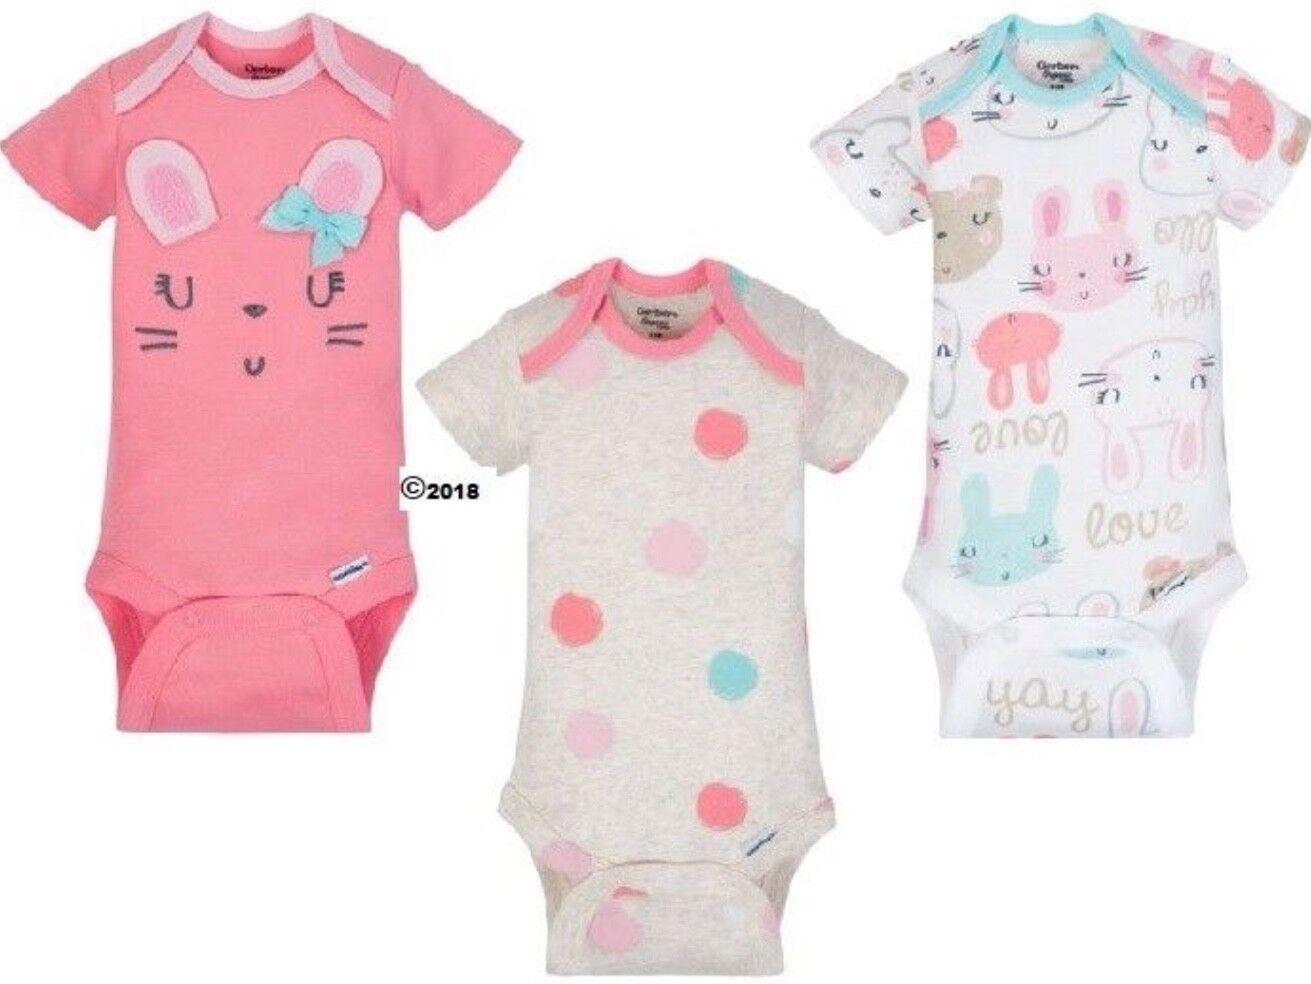 GERBER BABY GIRL Organic Cotton Onesies Bodysuits 3-Pk Bunny Pink Baby Gift